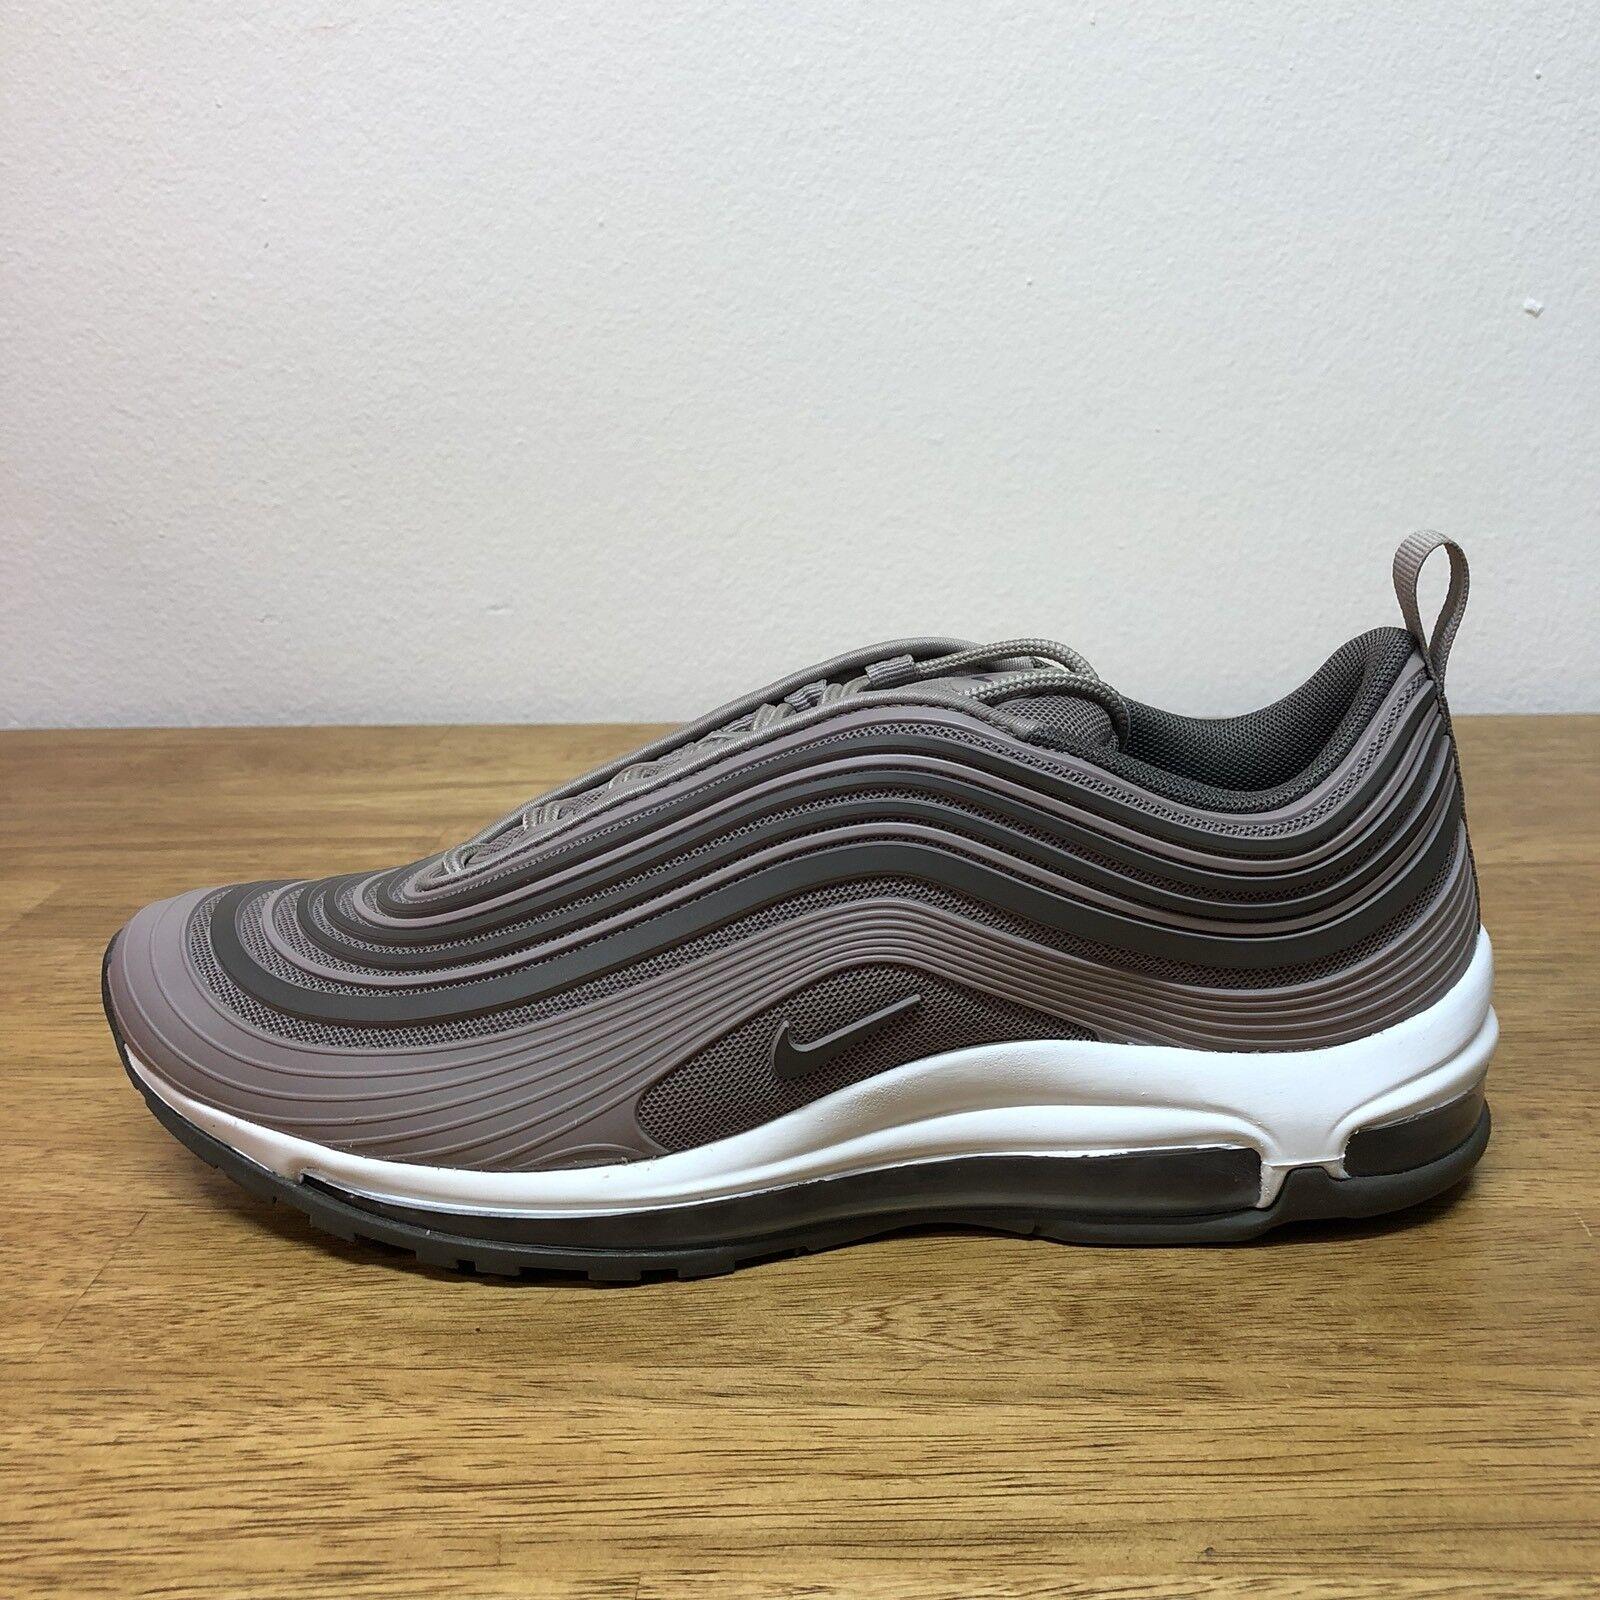 Nike air max 97 - ul - ultra